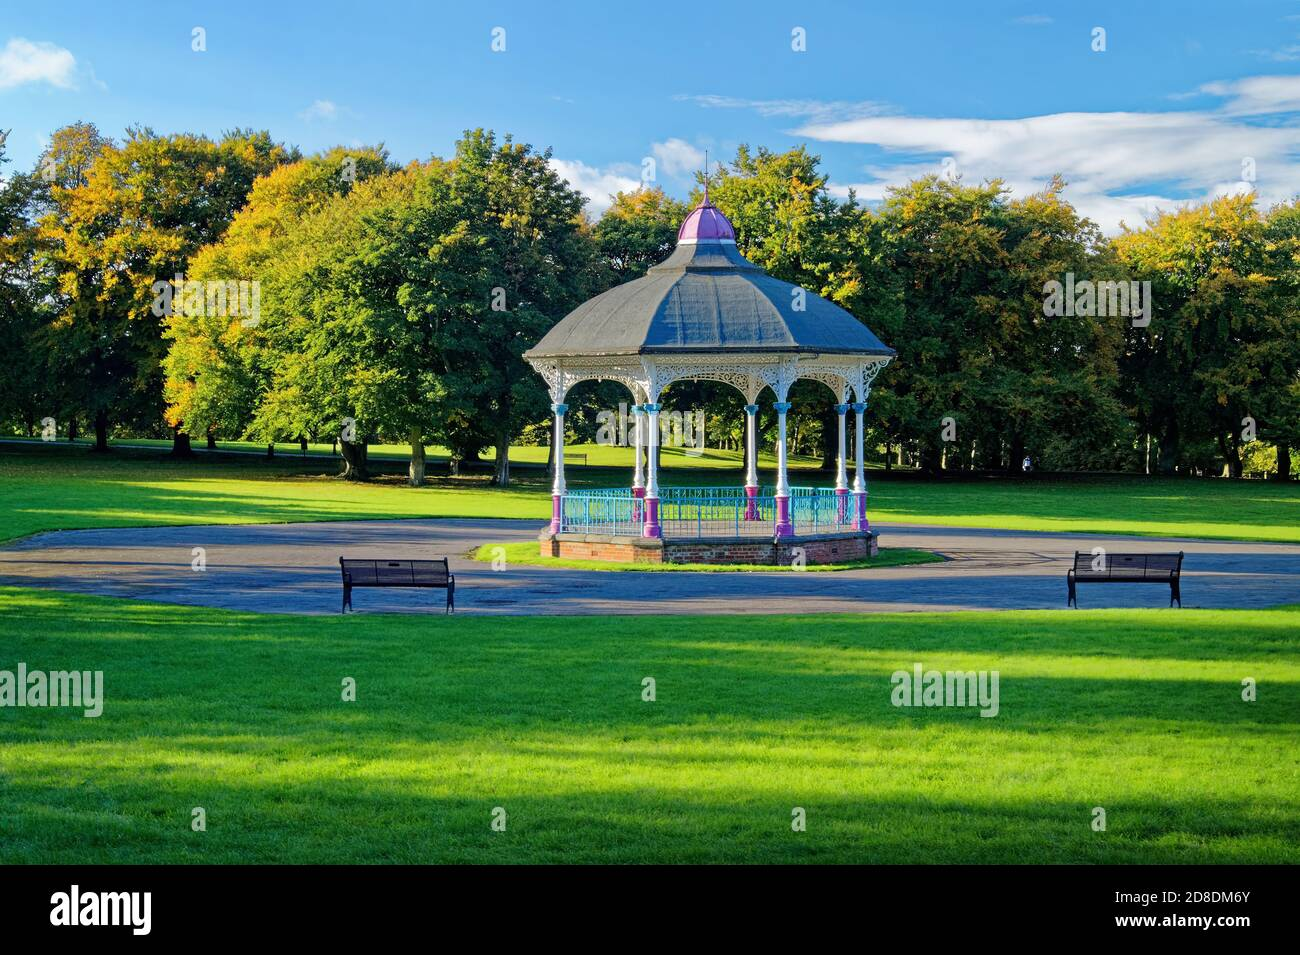 Großbritannien, South Yorkshire, Barnsley, Locke Park Bandstand Stockfoto